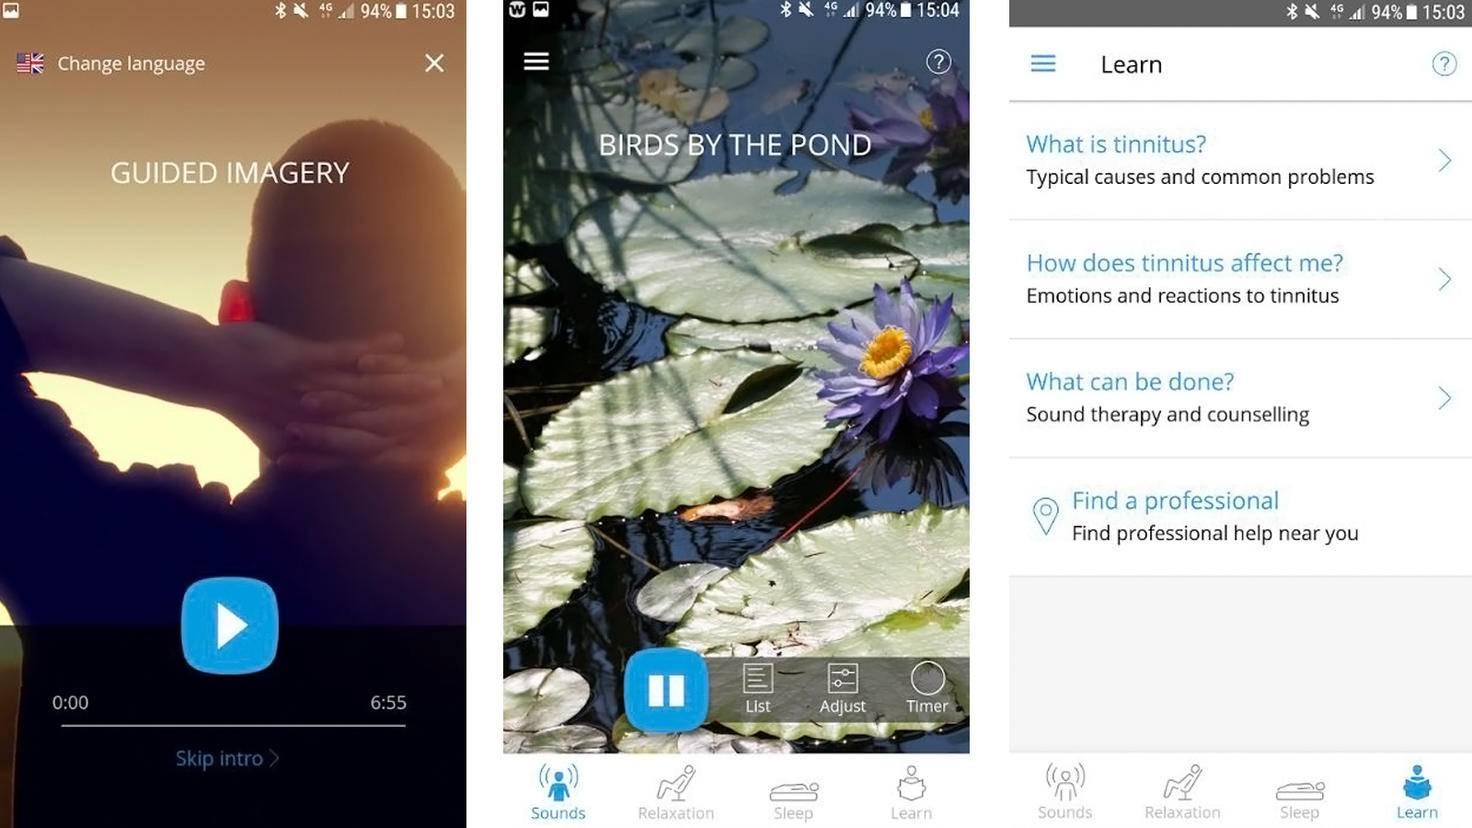 Widex Zen Tinnitus App-Google Play Store-Widex AS